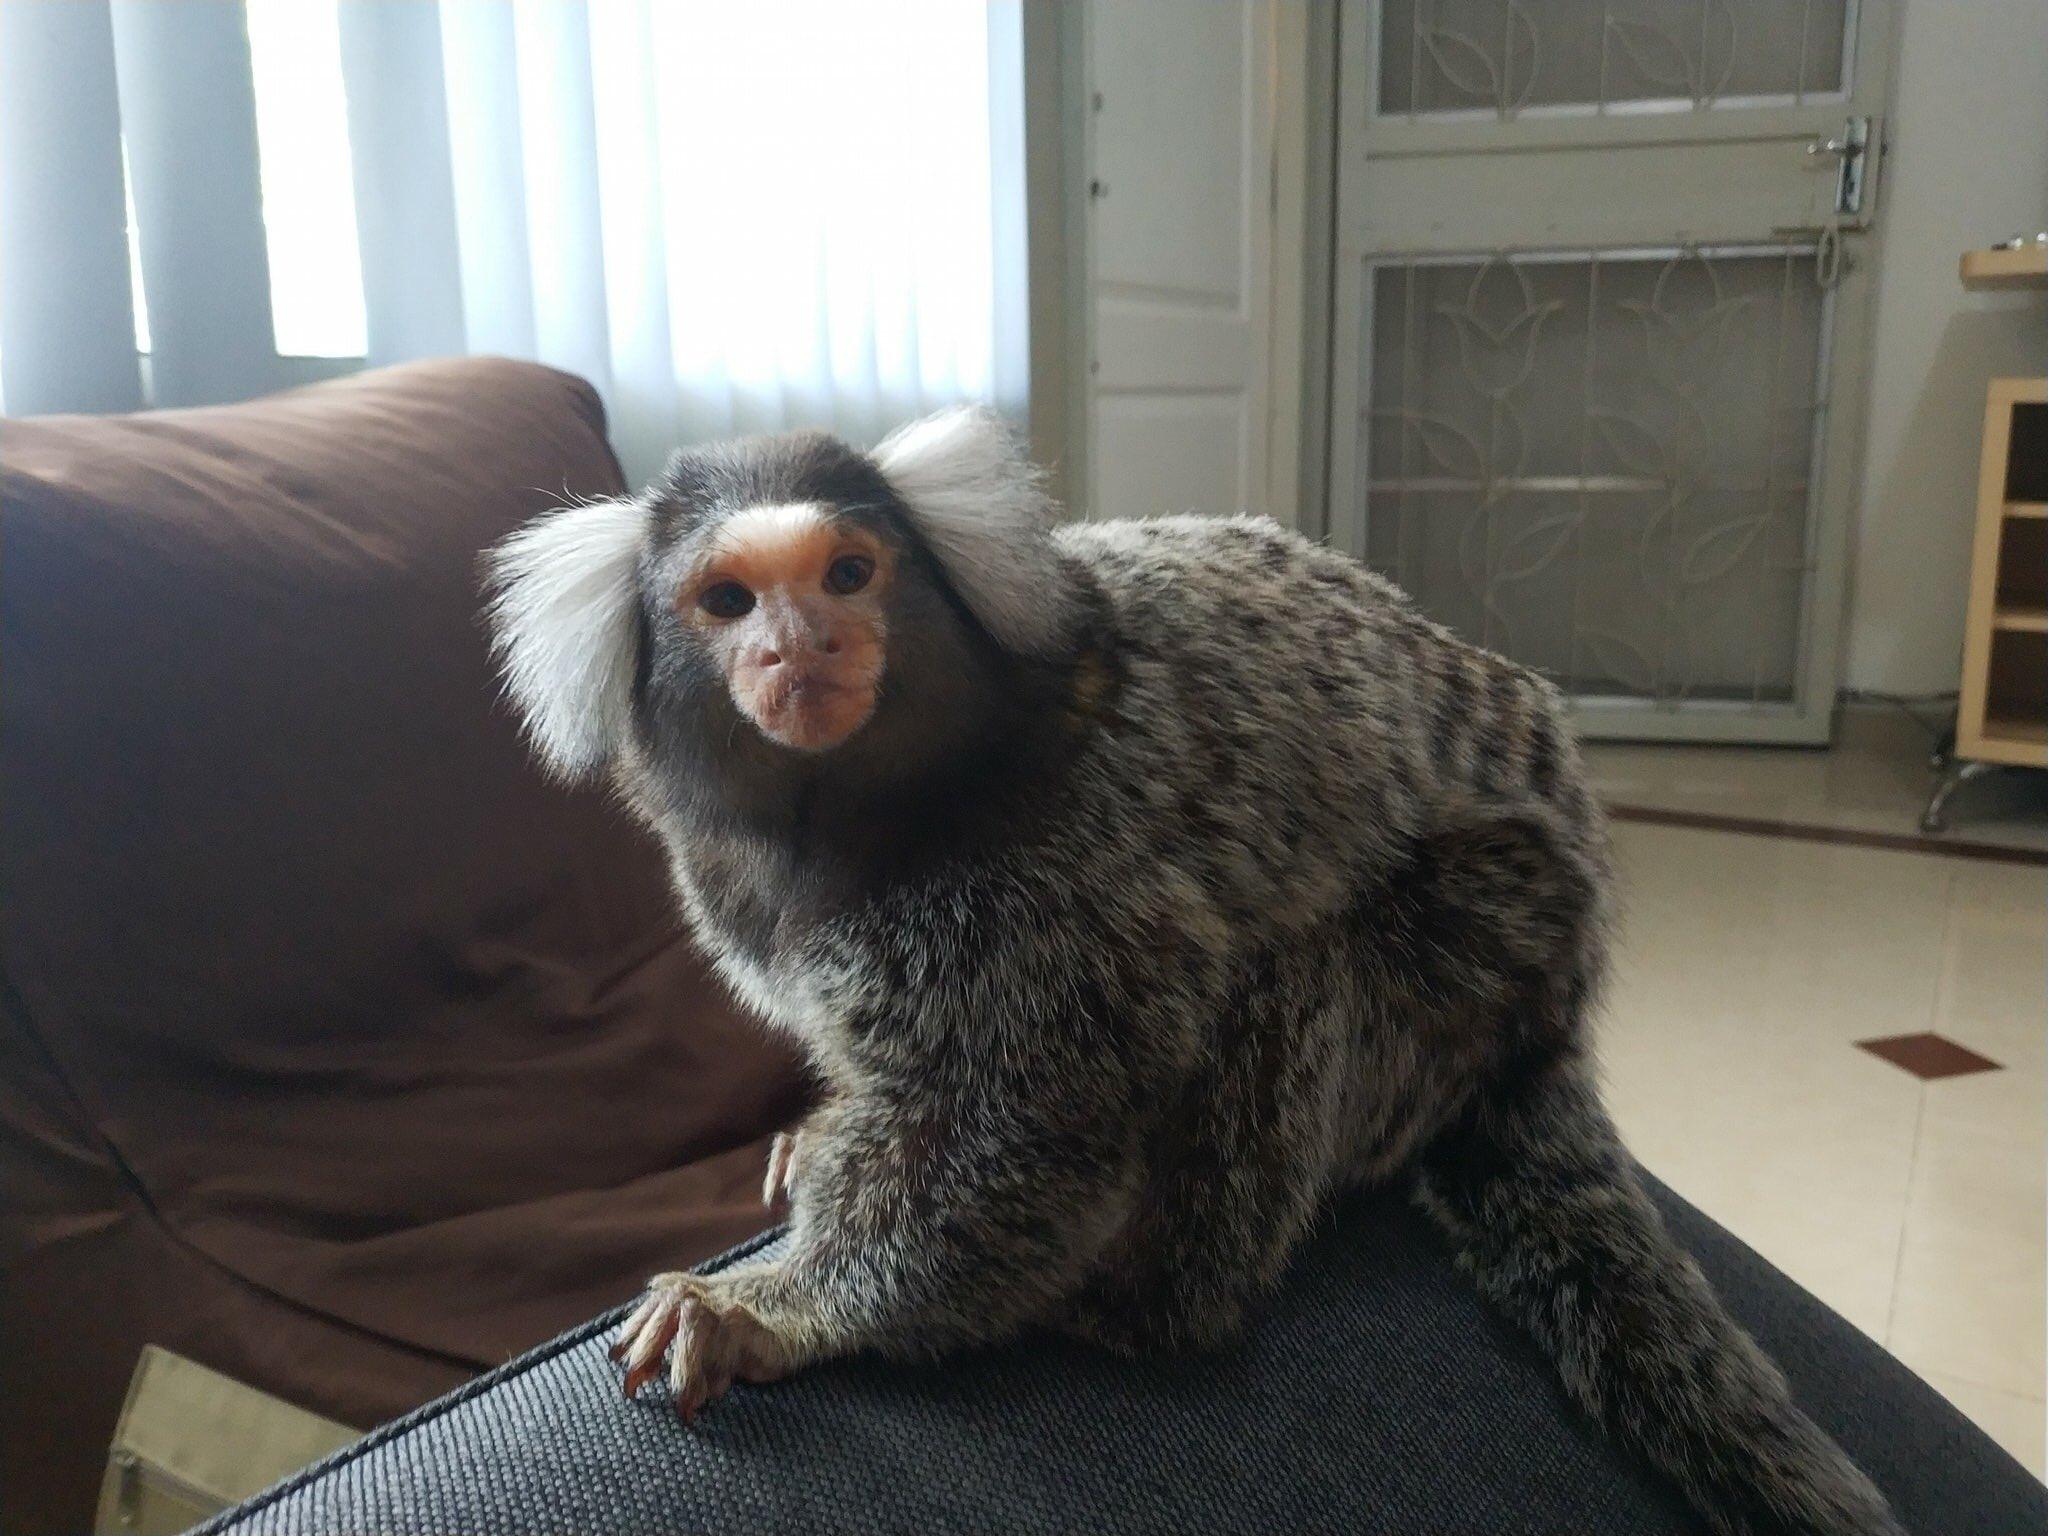 "Twitter पर ·͜·♡ lll: ""ลิงมาโมเสทหลงเข้ามาในบ้าน พิกัด ศุภาลัย พาร์ควิลล 2  พหลโยธิน48 #ตามหาเจ้าของ #ทวิตดีคนรีน้อย #ลิงมาโมเสท #ลิงหาย… """